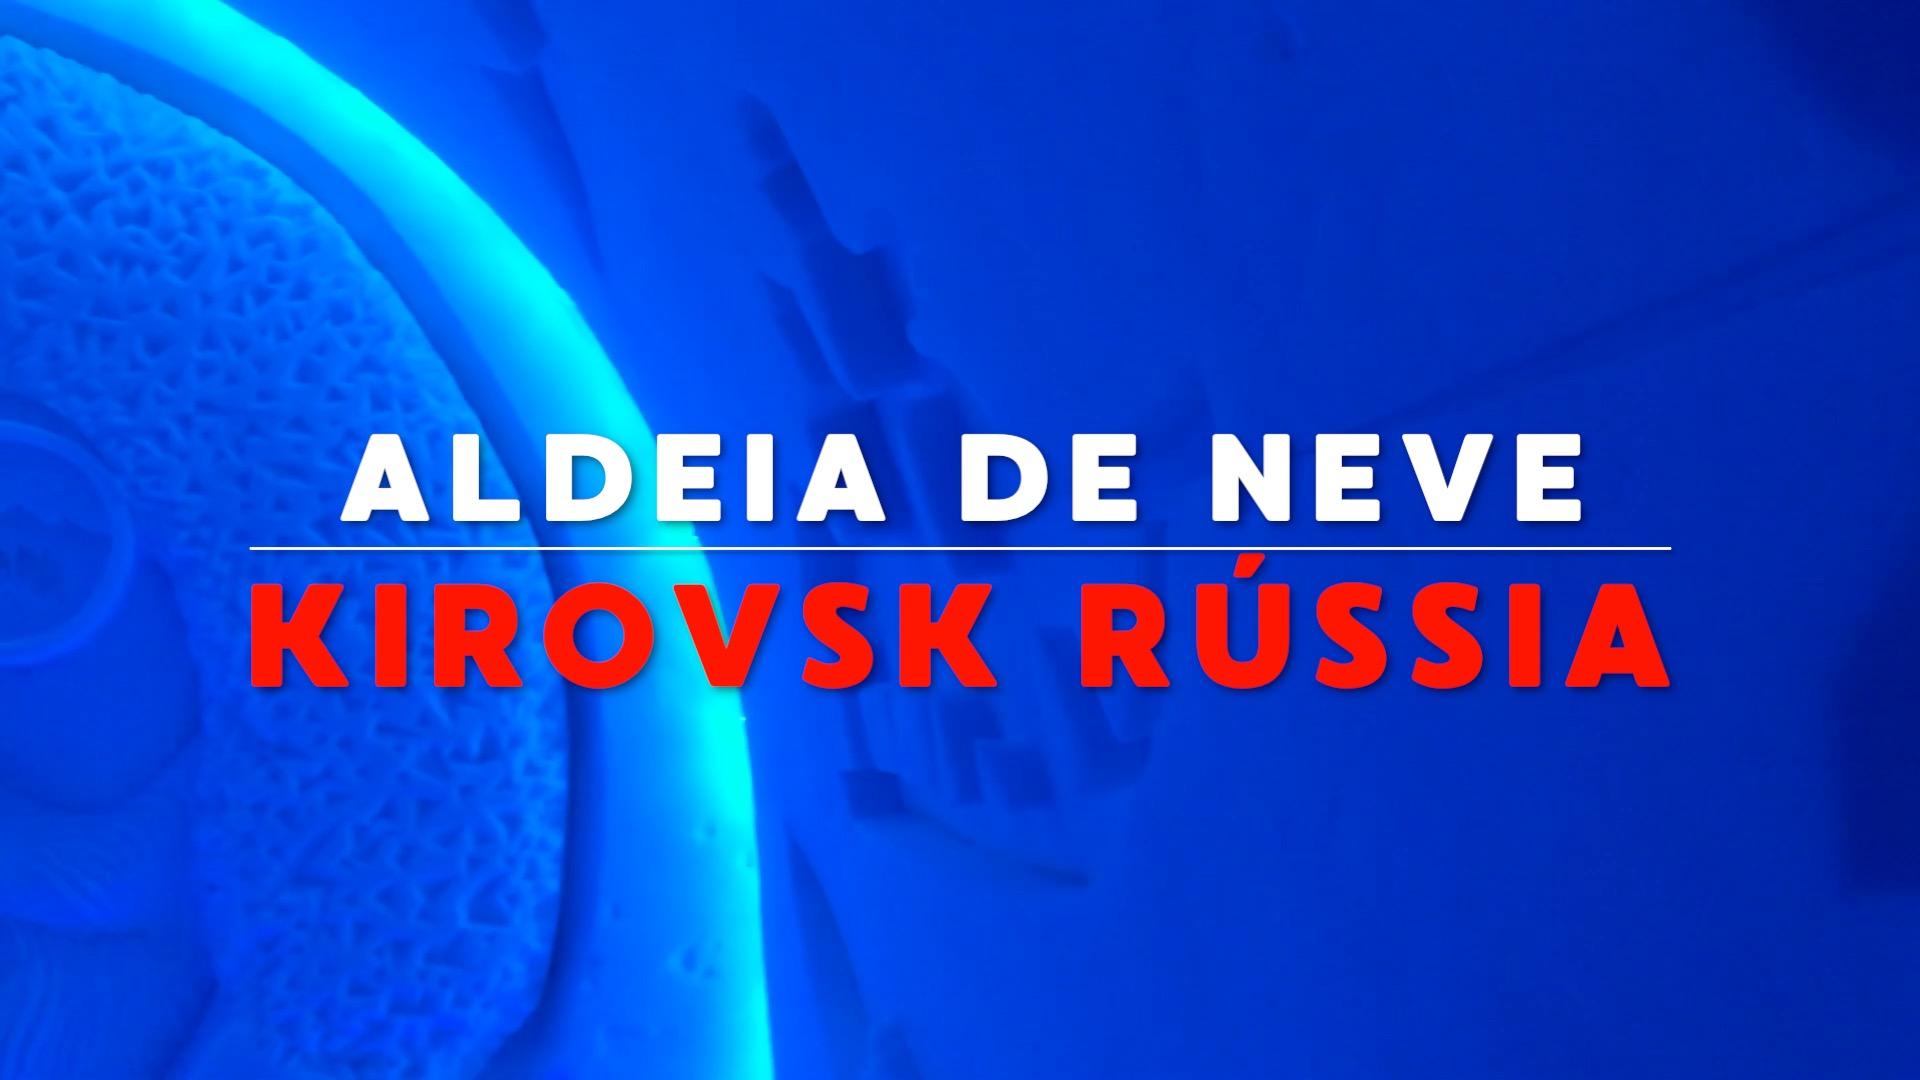 Aldeia de Neve Kirovsk Russia Circulo Polar Artico